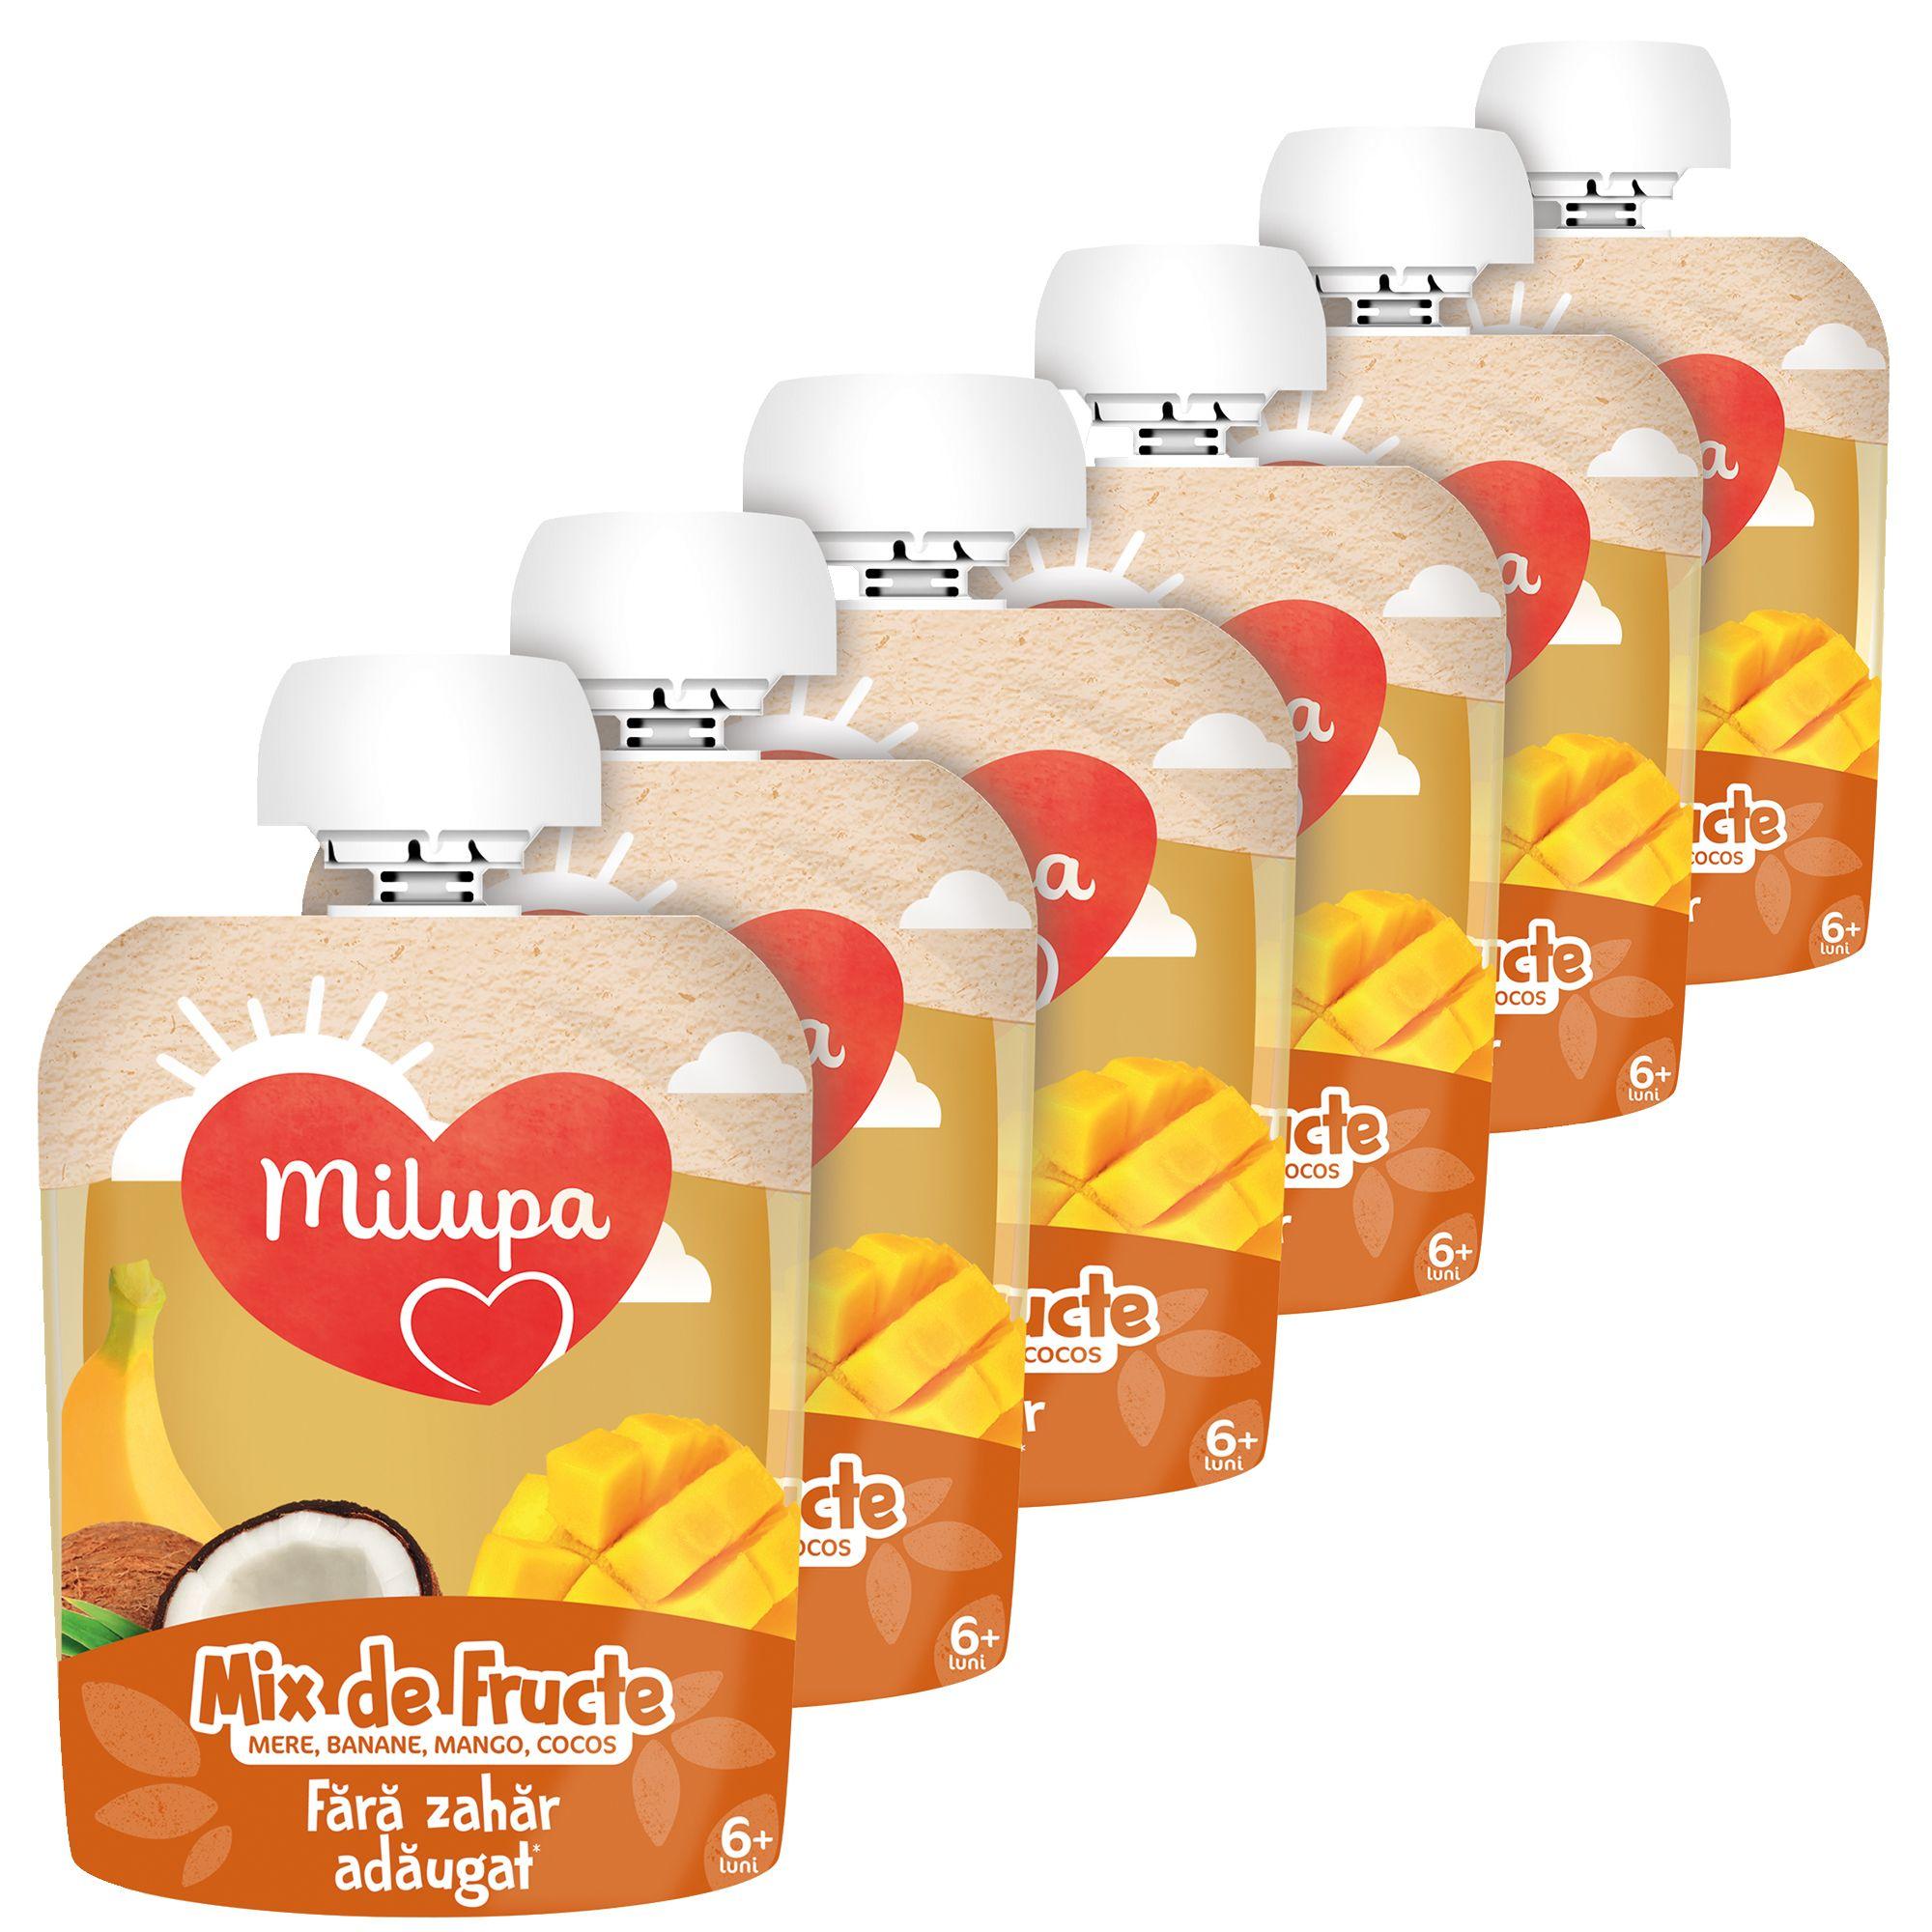 Pachet 6 x Mix de fructe (mere, banana, mango, cocos), Milupa, 90g